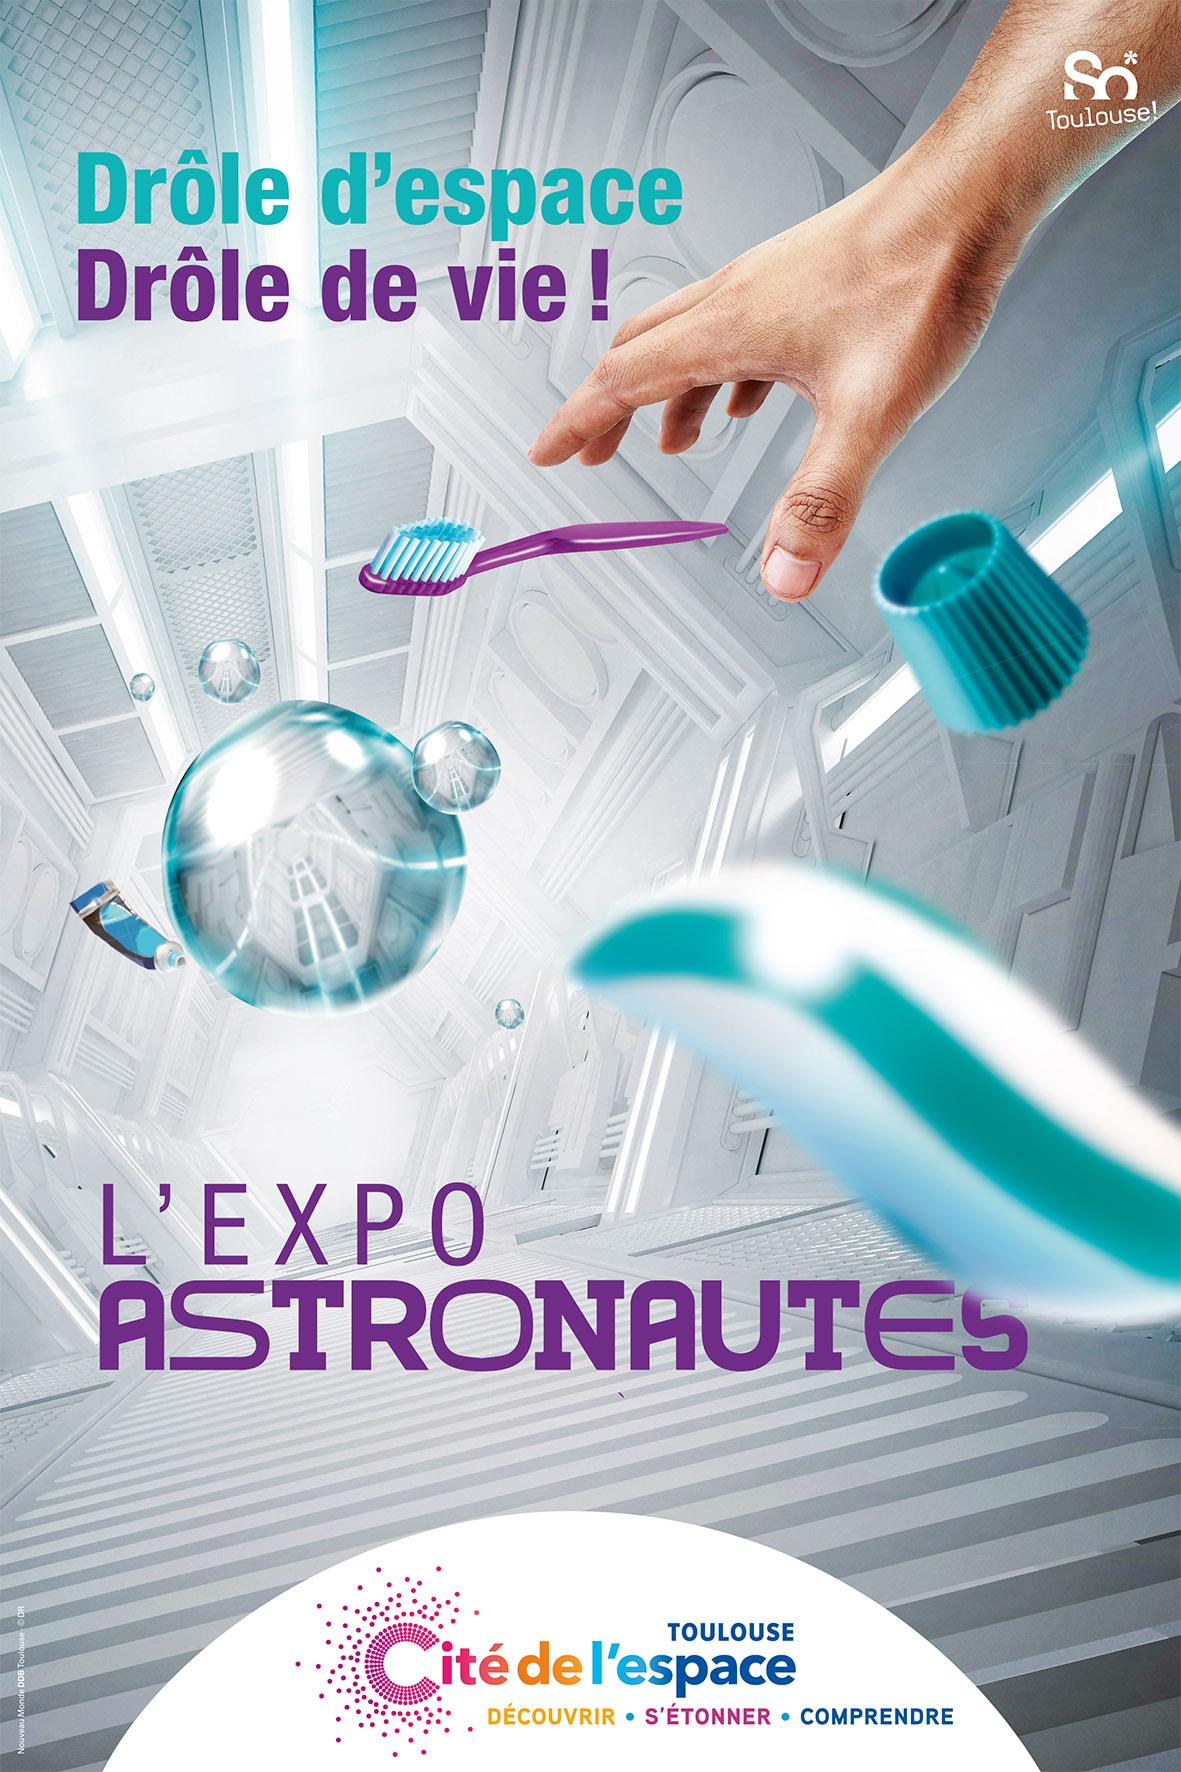 prx_affiche-expo-astronaute-cite-espace.jpg